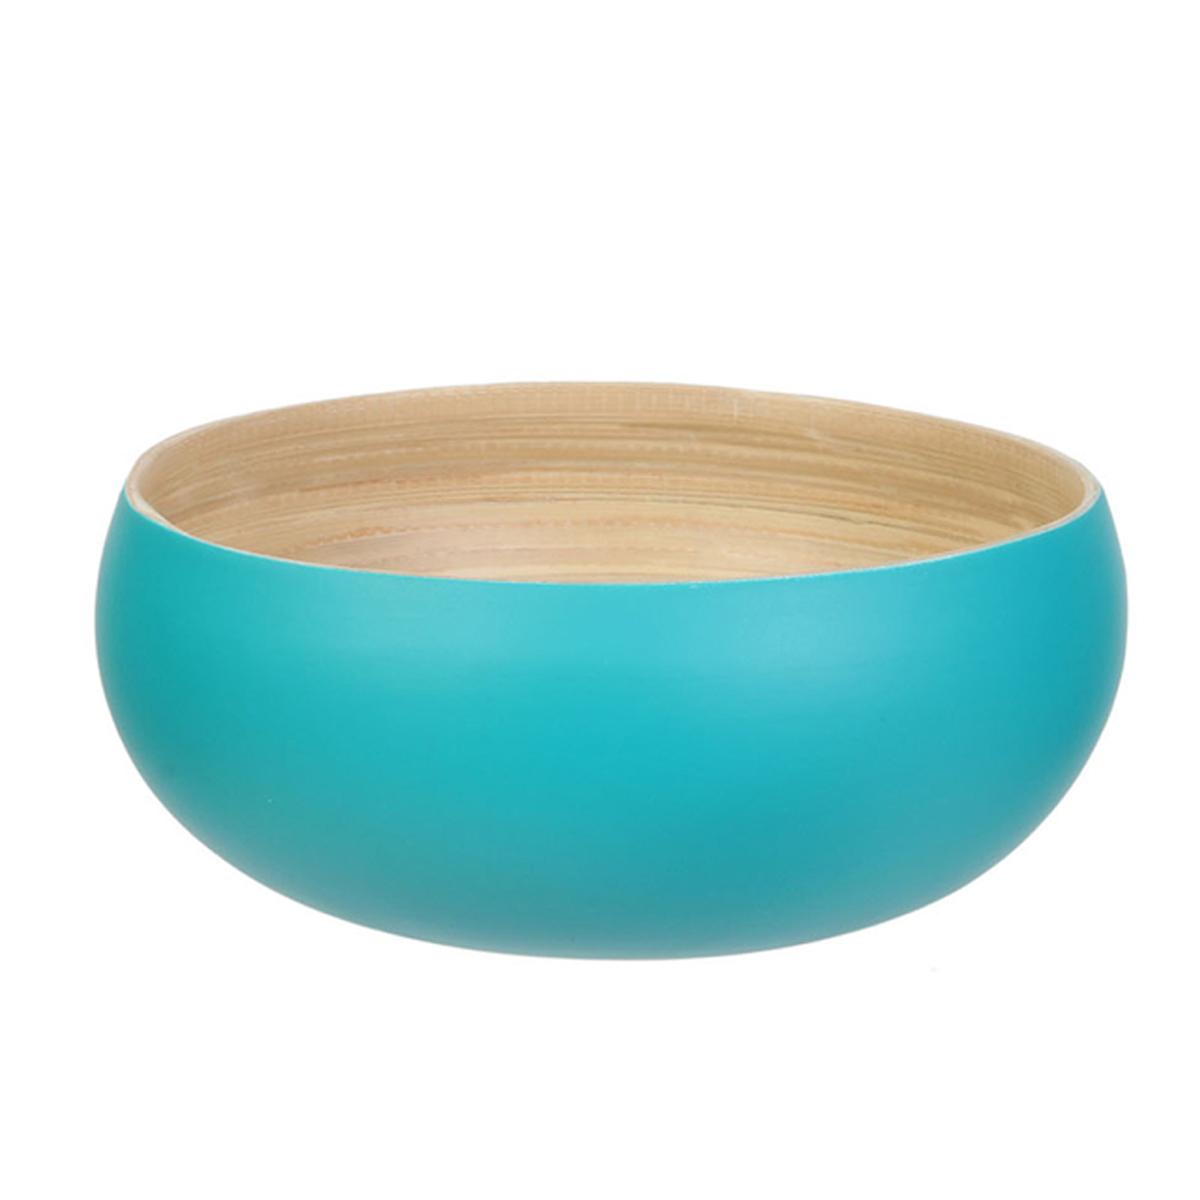 Saladier bambou \'Boho\' turquoise beige - 19x85 cm (15L) - [R2863]